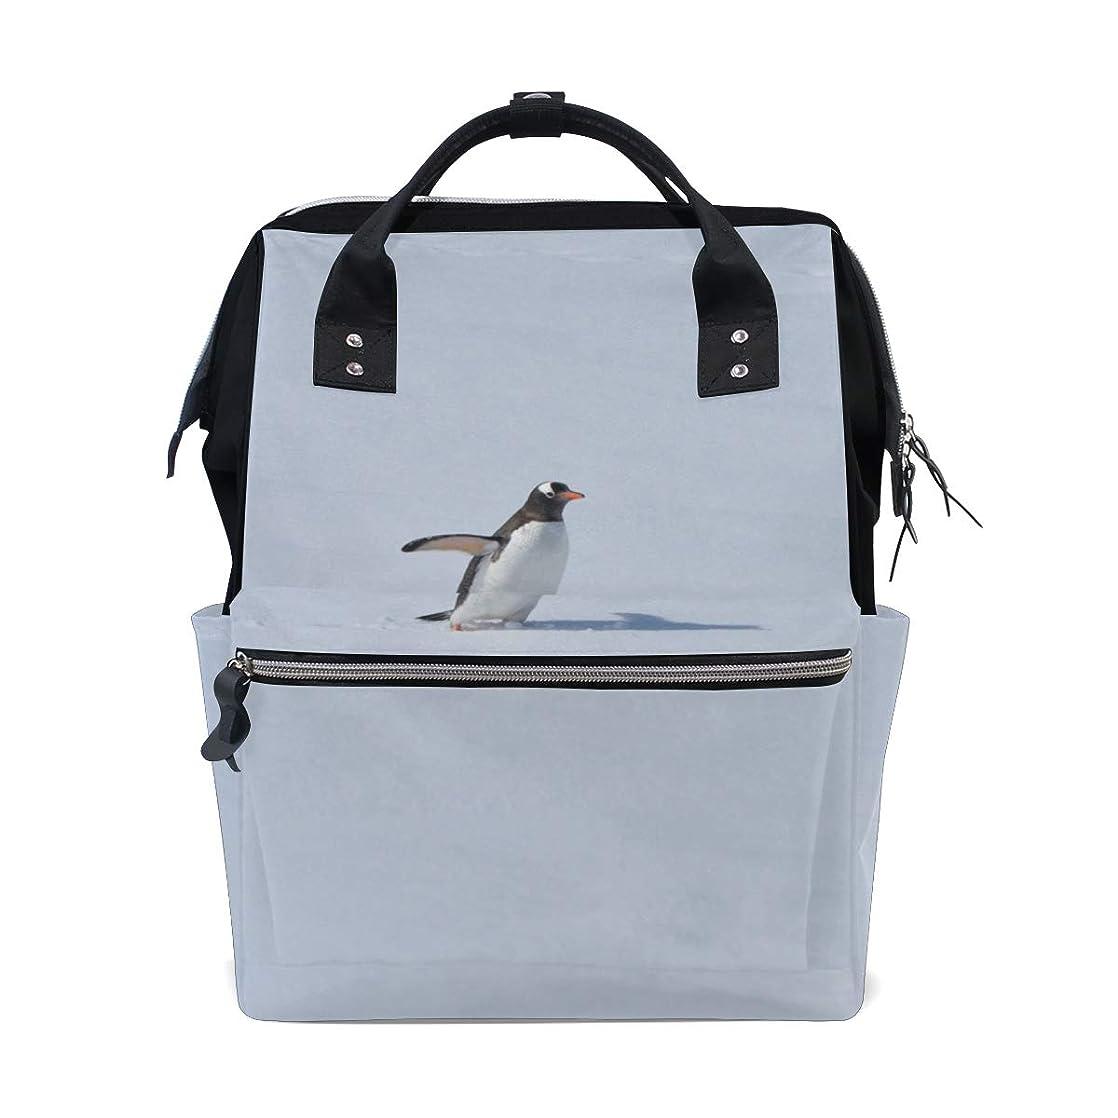 Backpack Snow Penguins School Rucksack Diaper Bags Travel Shoulder Large Capacity Bookbag for Women Men bvcssccw88339